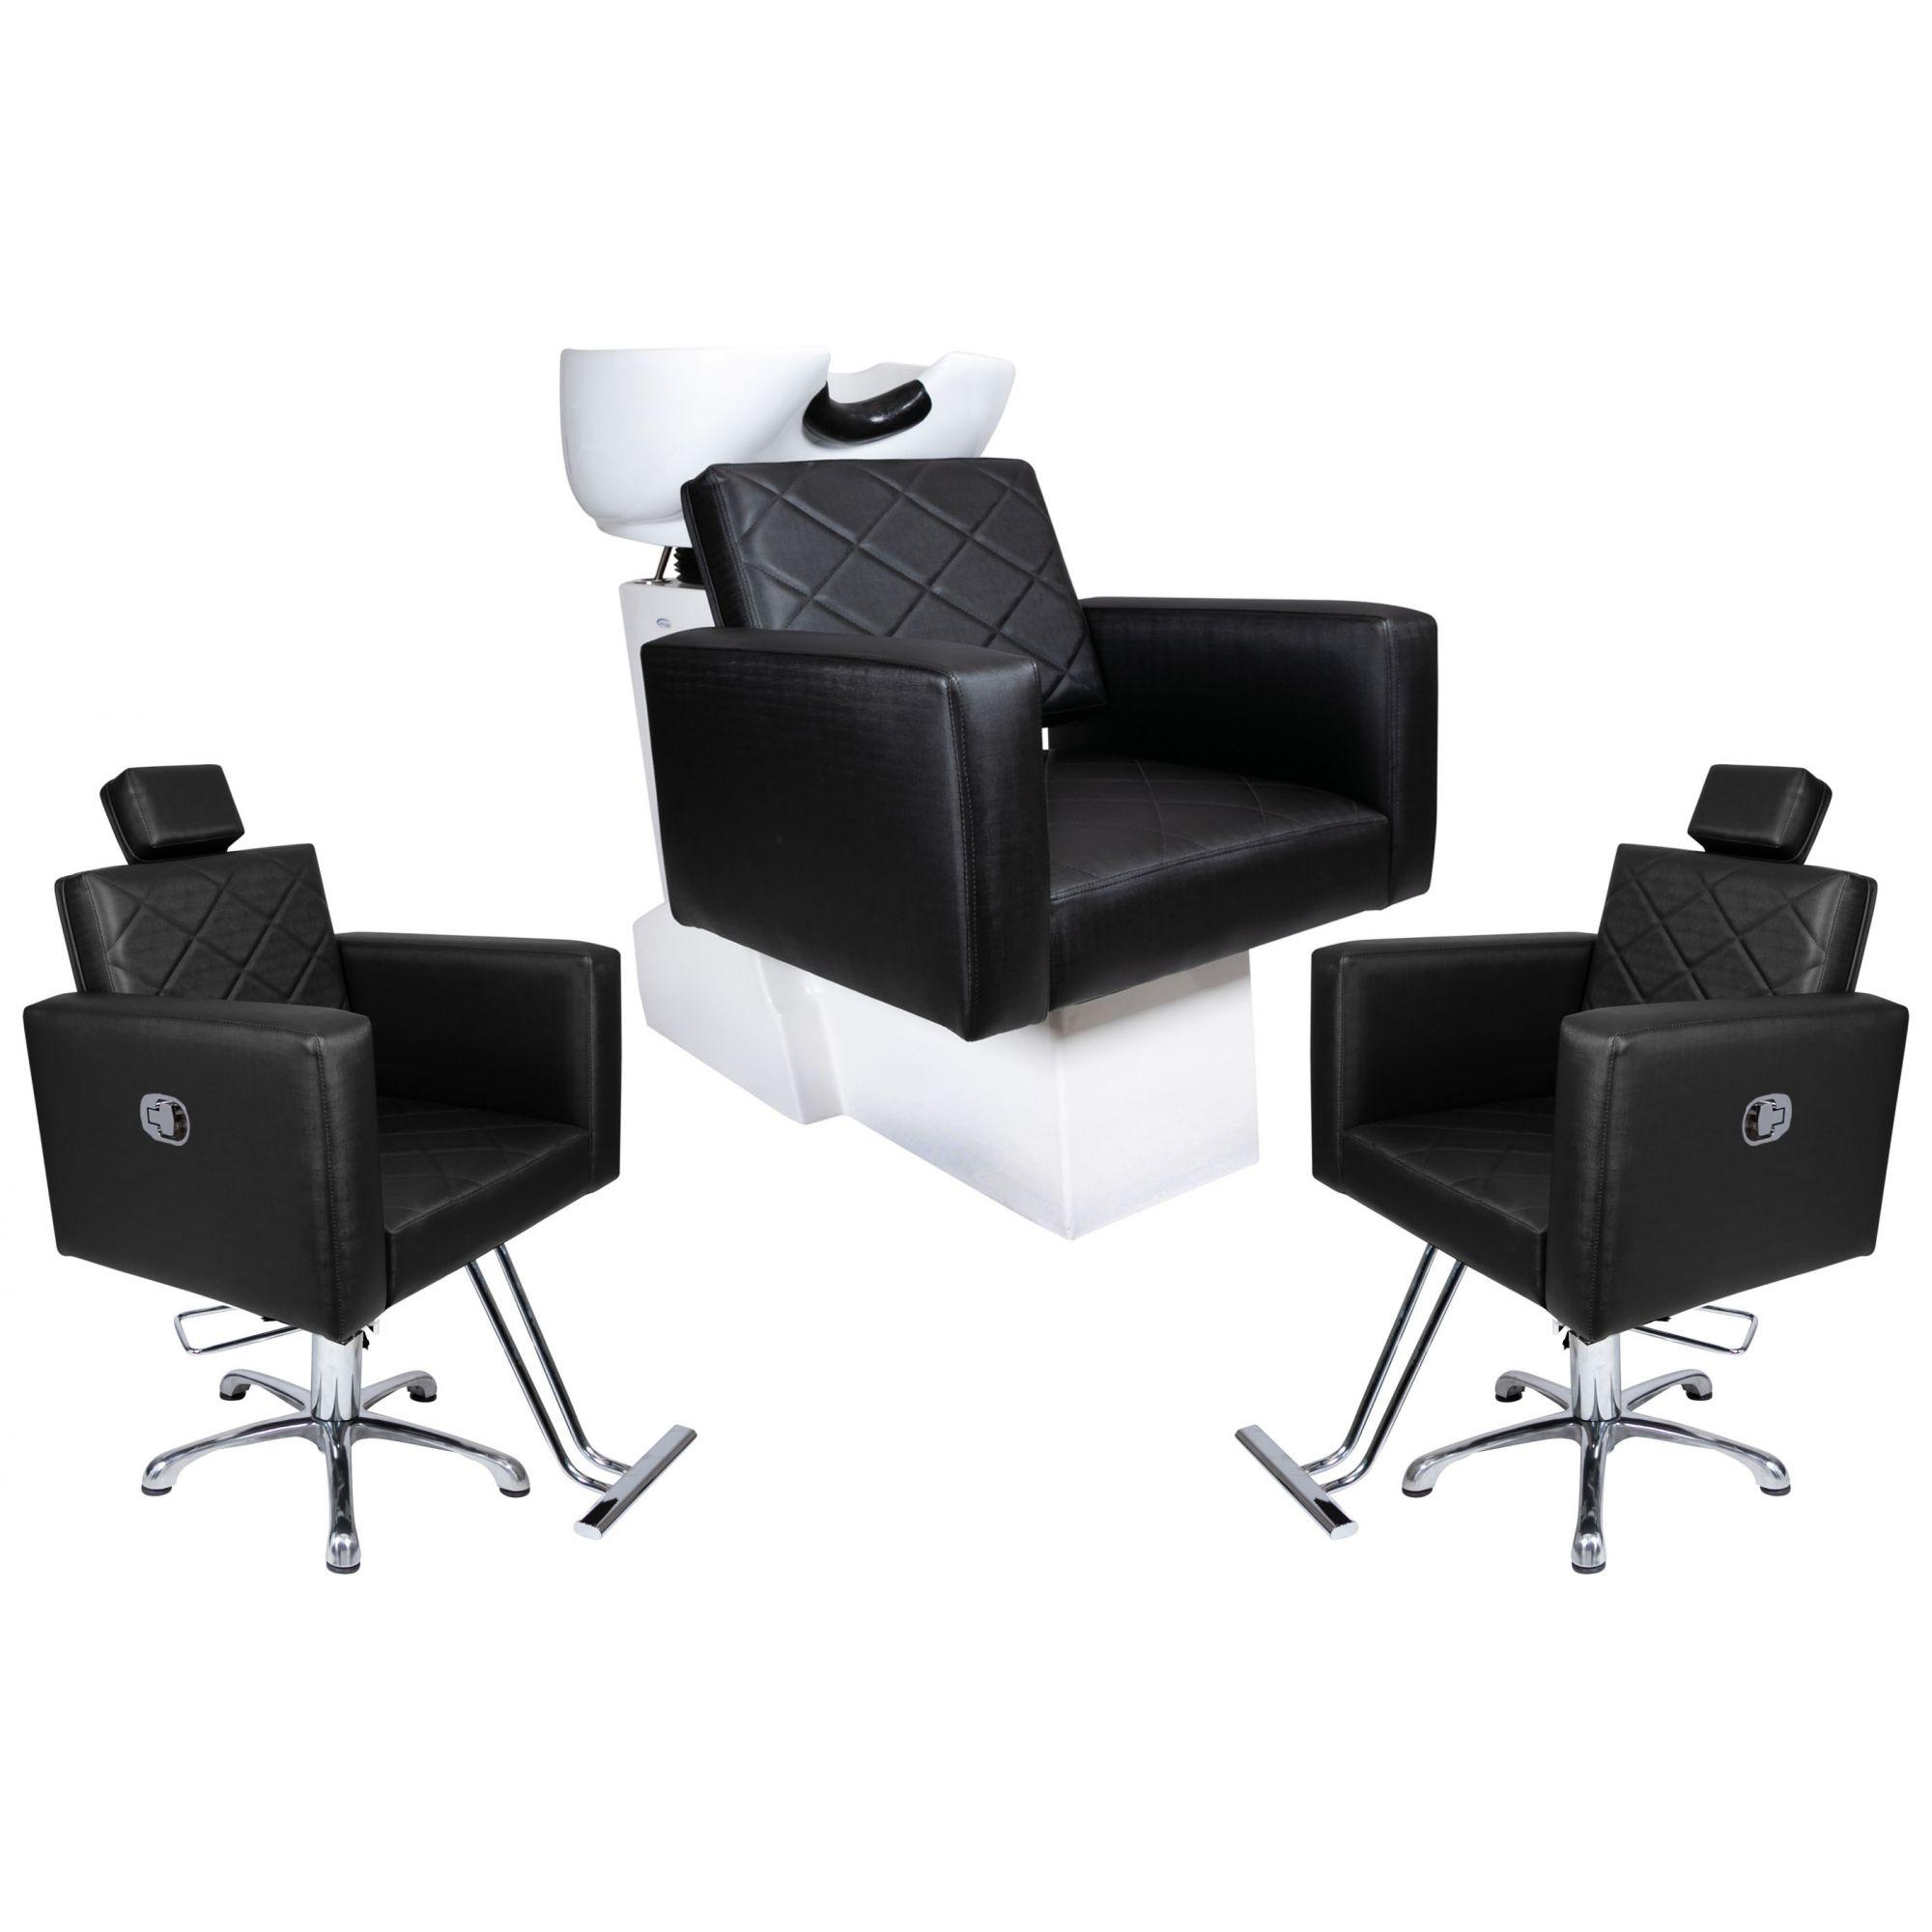 KIT Evidence - 2 Cadeiras Reclináveis + 1 Lavatório - BF